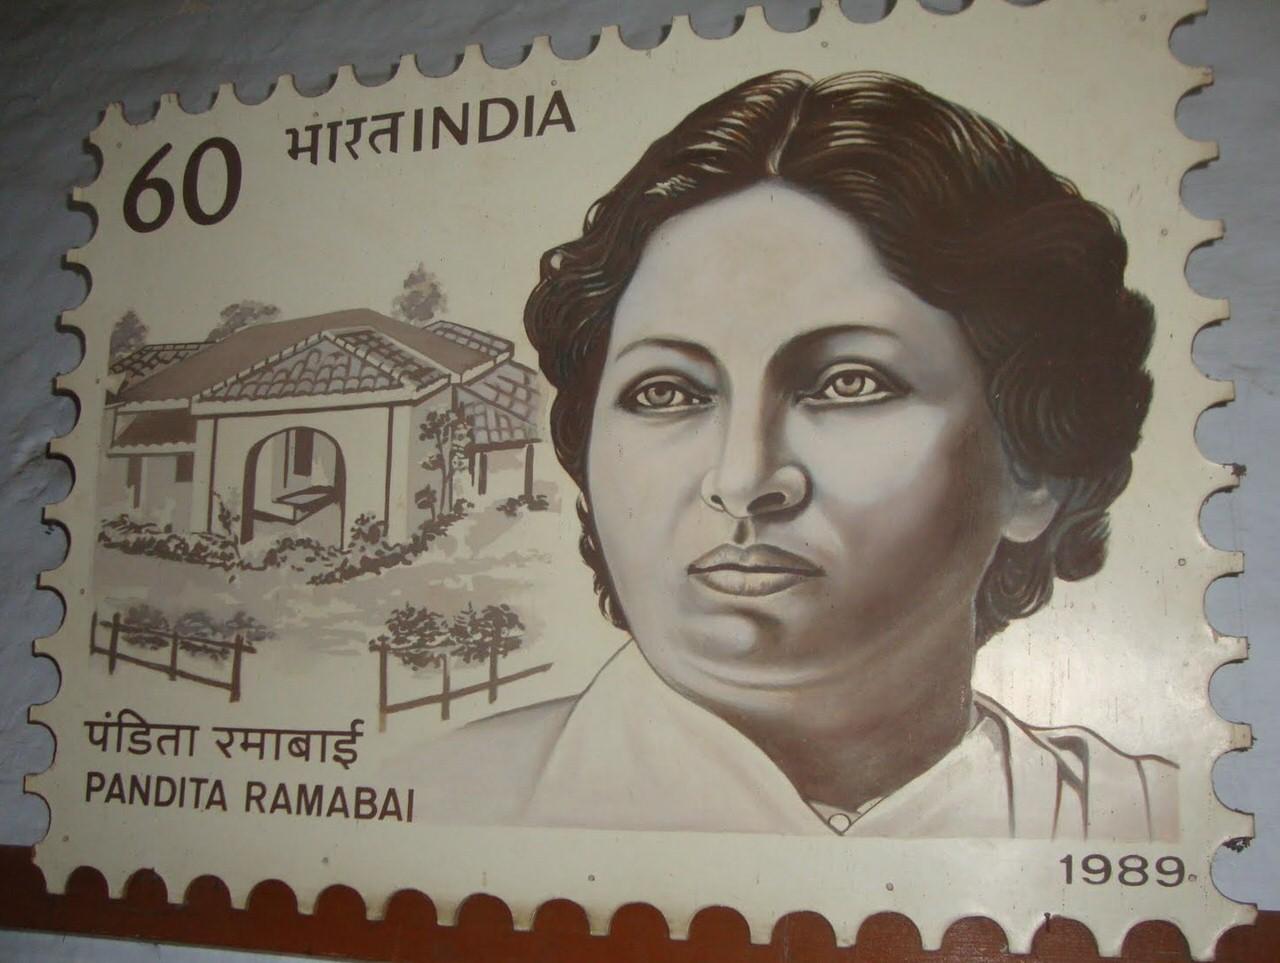 Life Of Pandita Ramabai: Championing Women's Education And Social Reform | #IndianWomenInHistory